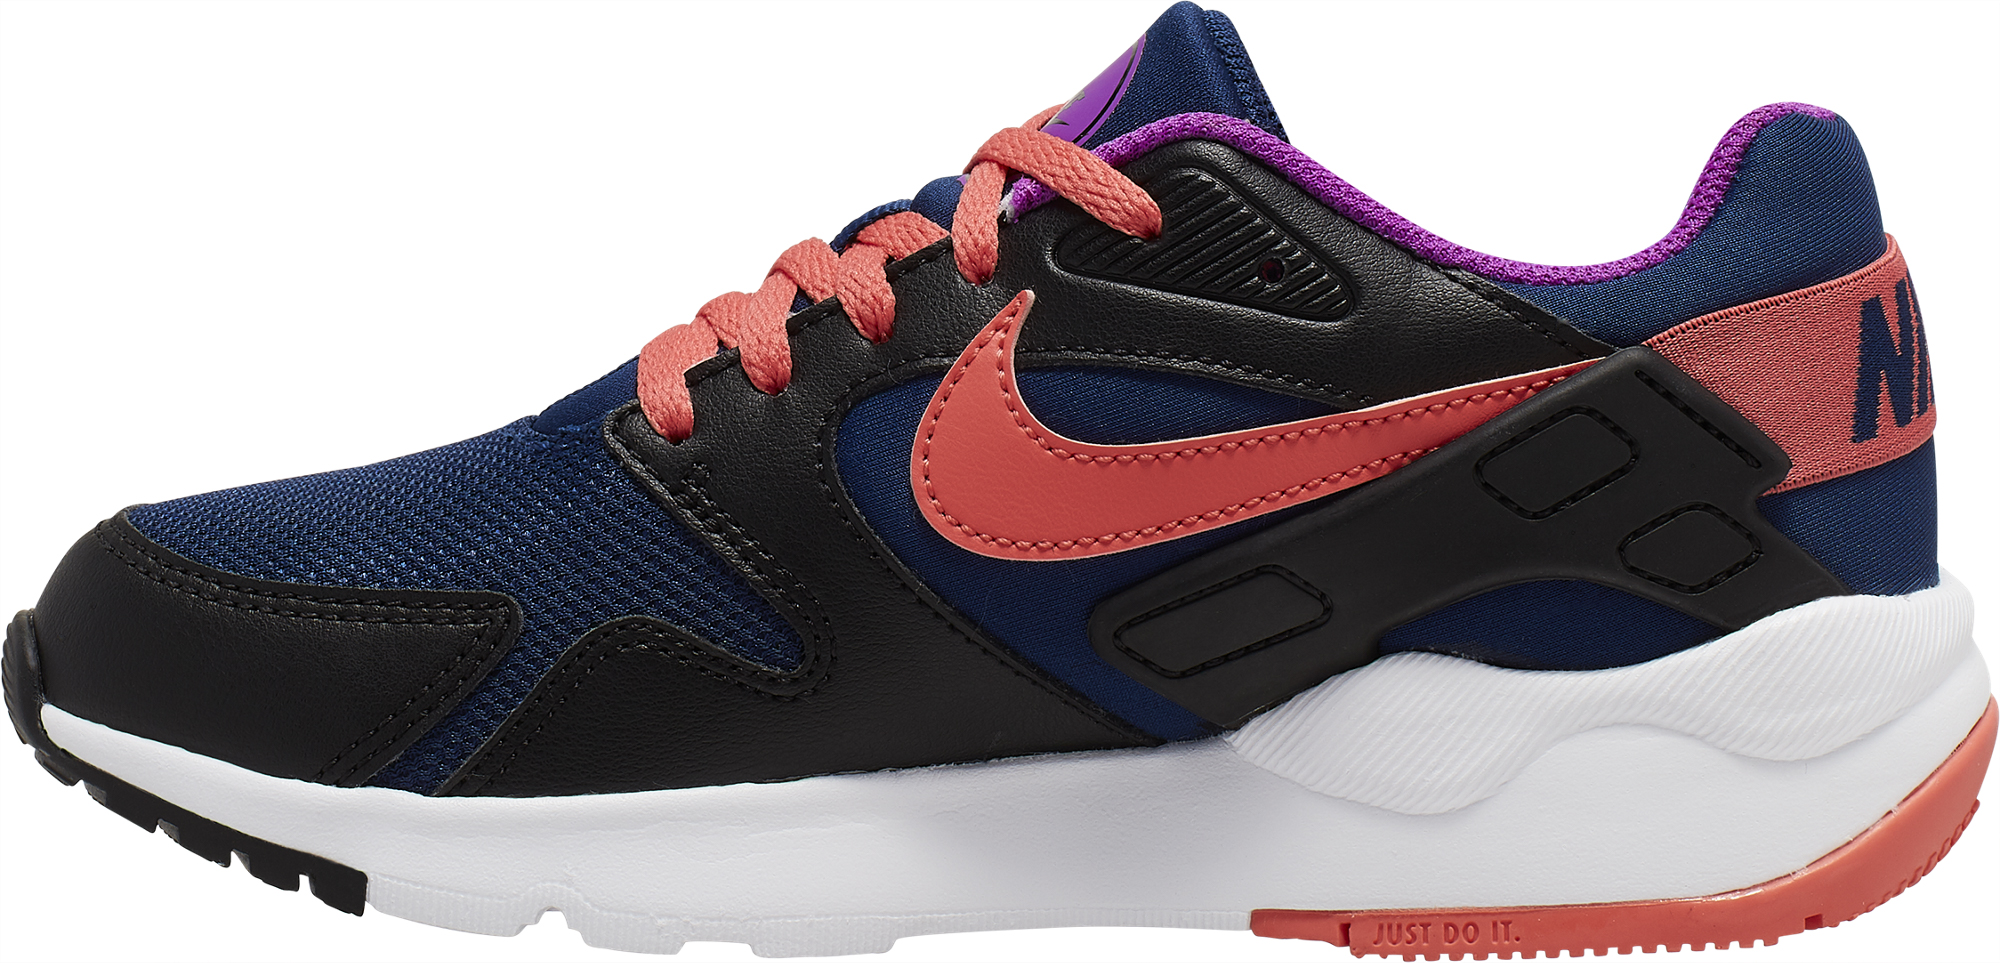 Nike Кроссовки для девочек Nike LD Victory, размер 36,5 цена